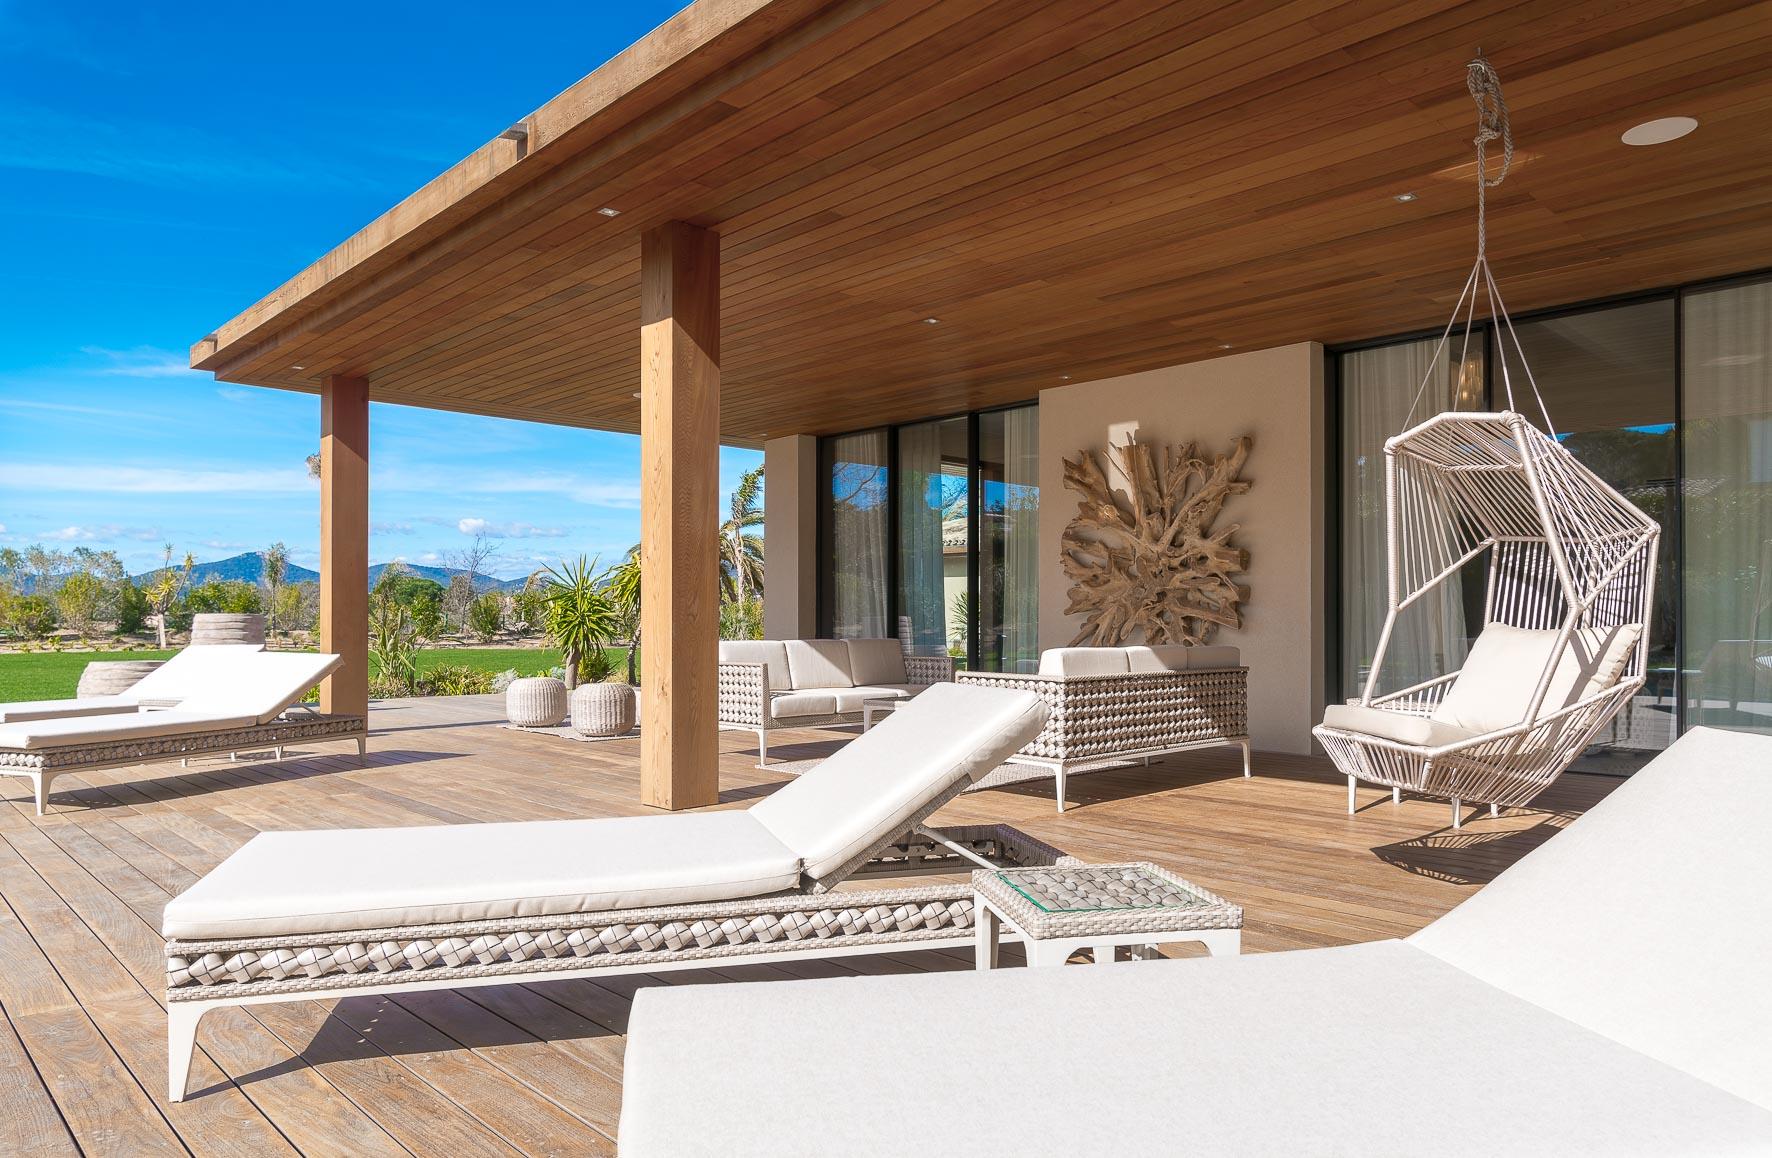 lyxig villa uthyrning stranden saint tropez -15